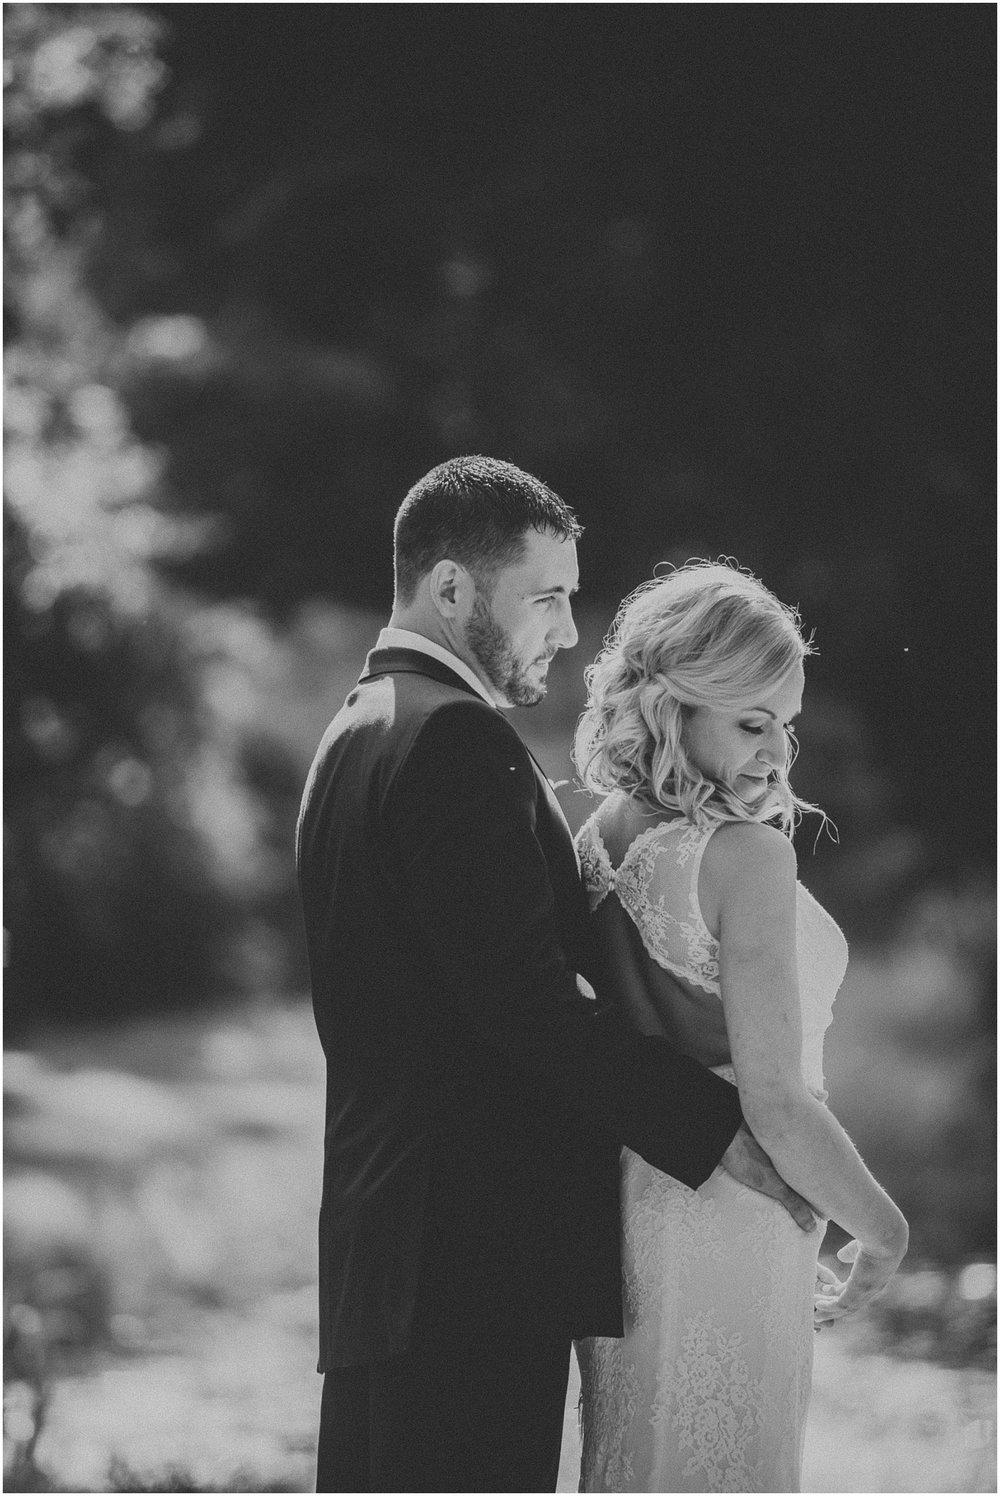 waterloo-village-waterloo village-wedding-outdoor wedding-rustic-boemian-new jersey-bride-groom-wedding party-davids bridal-wedding dress-wedding-first kiss-intimate wedding_0363.jpg